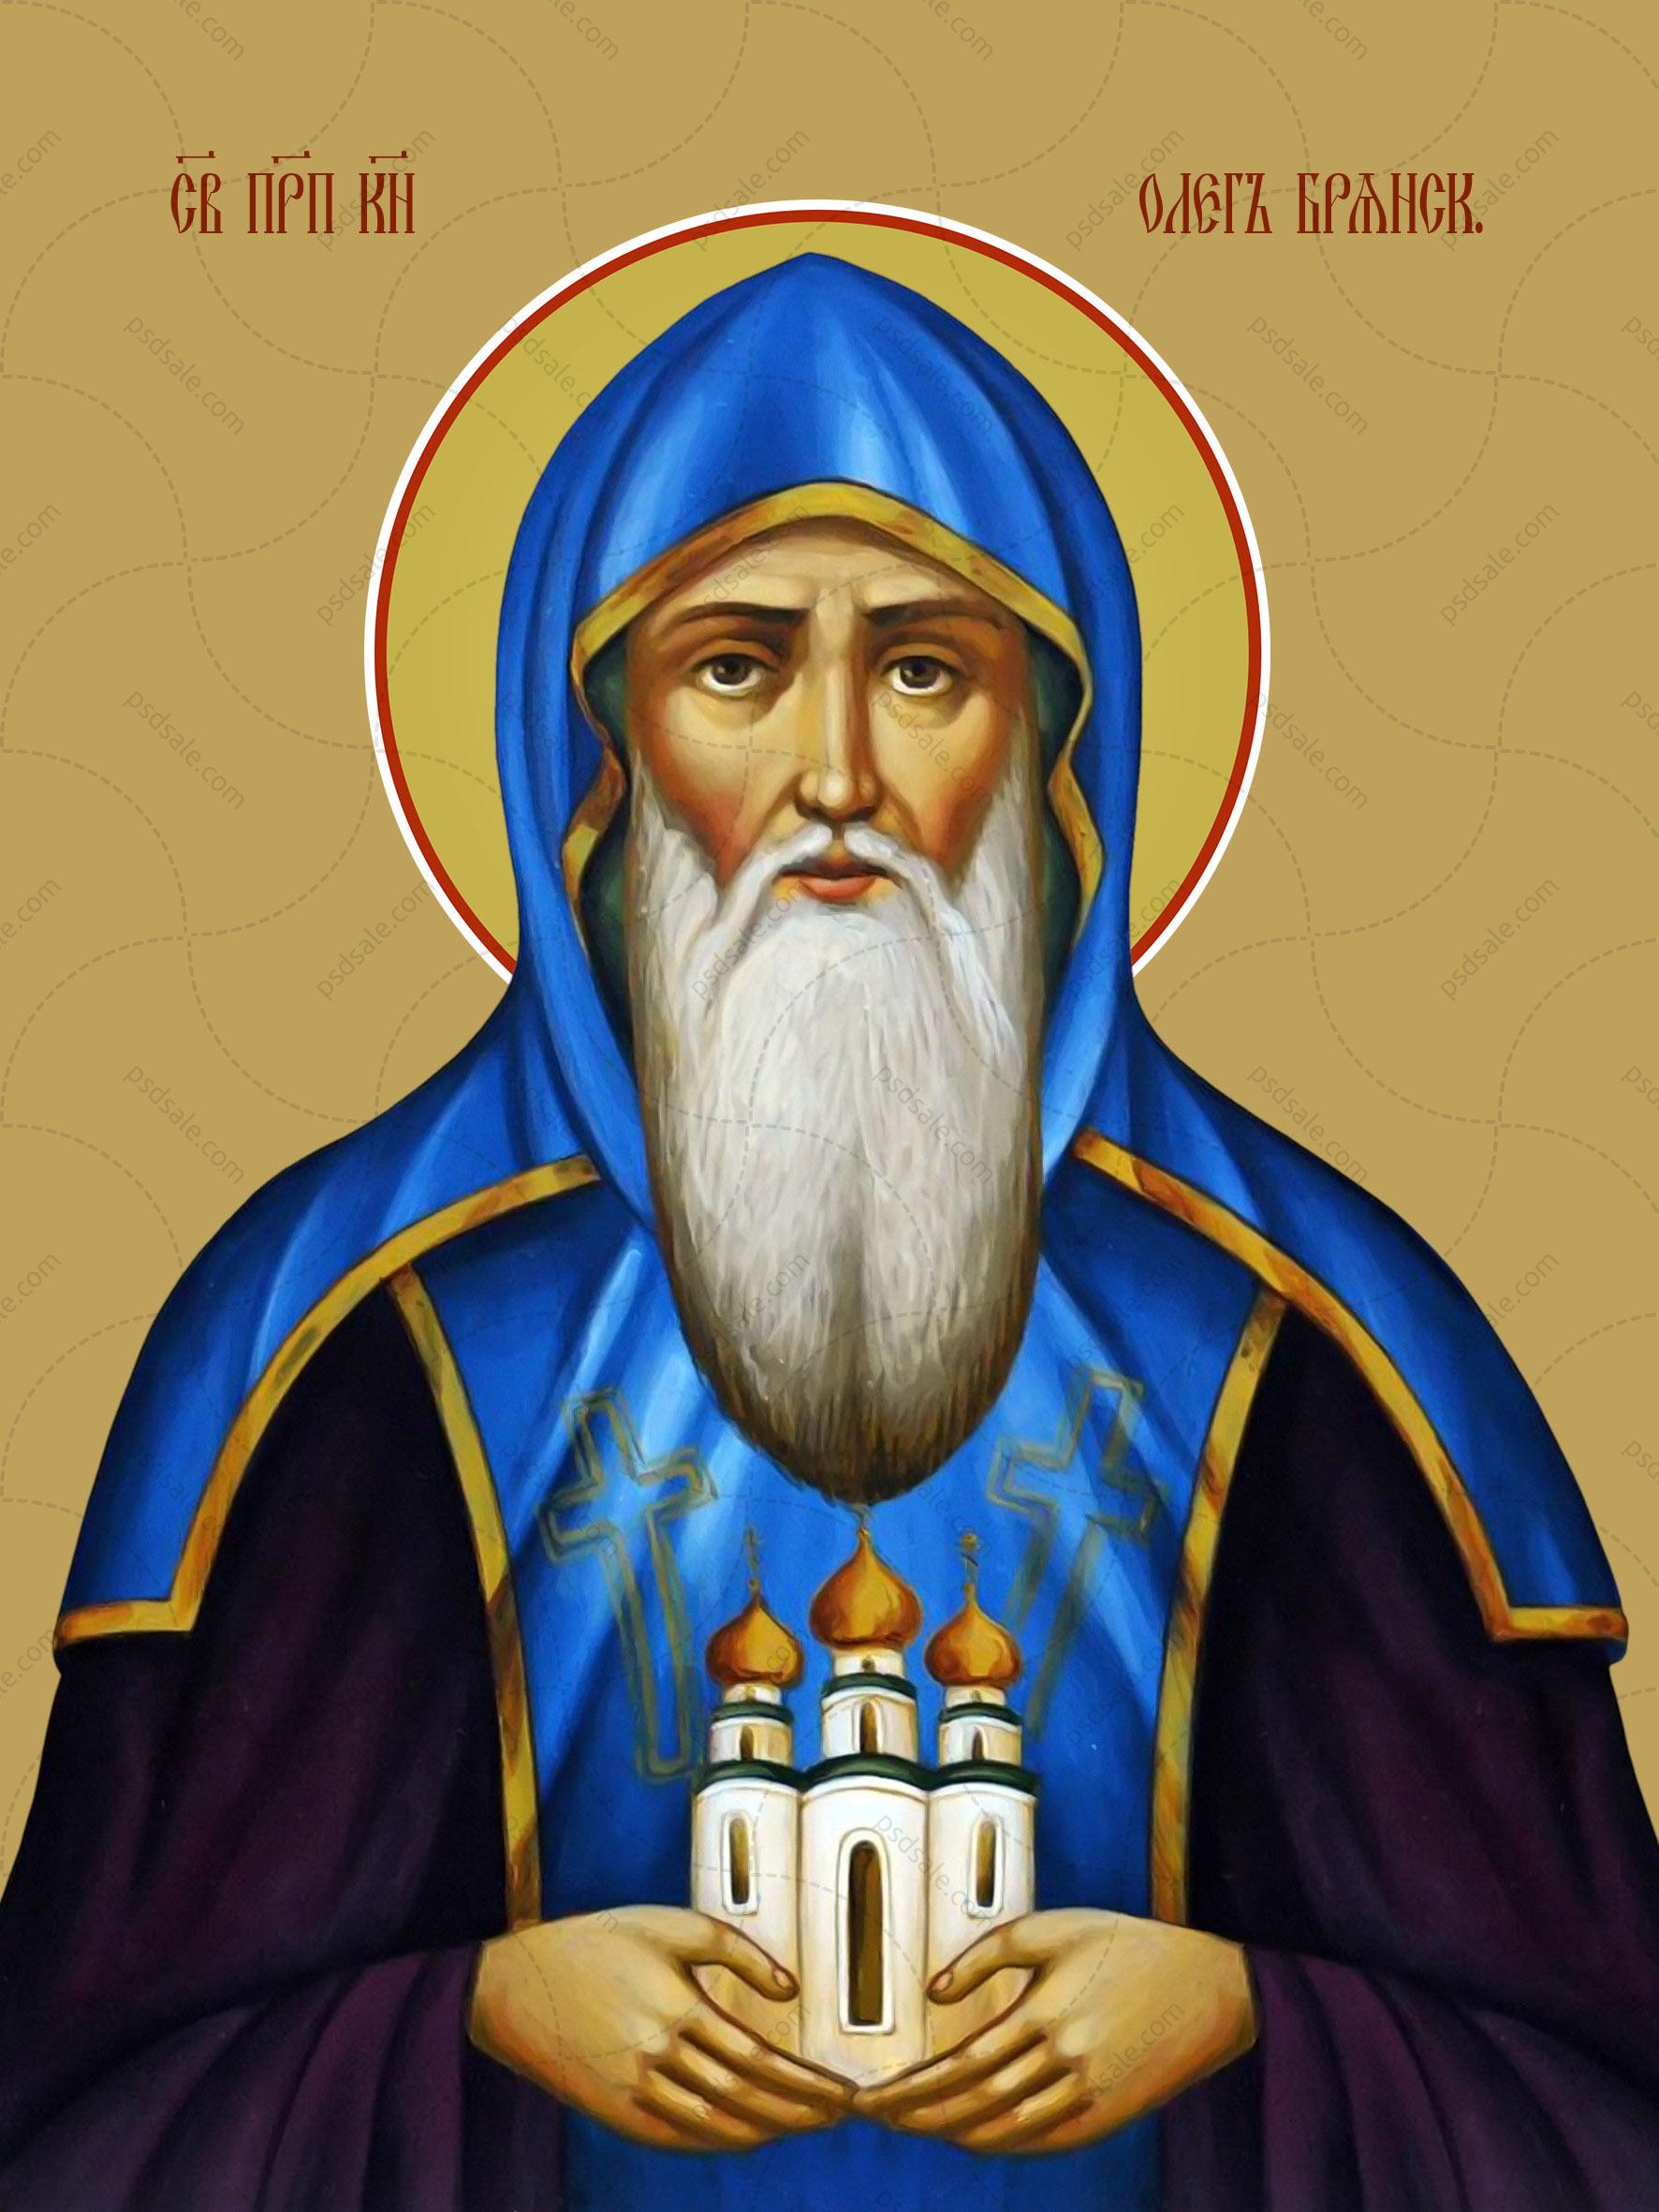 Олег Брянский, святой князь